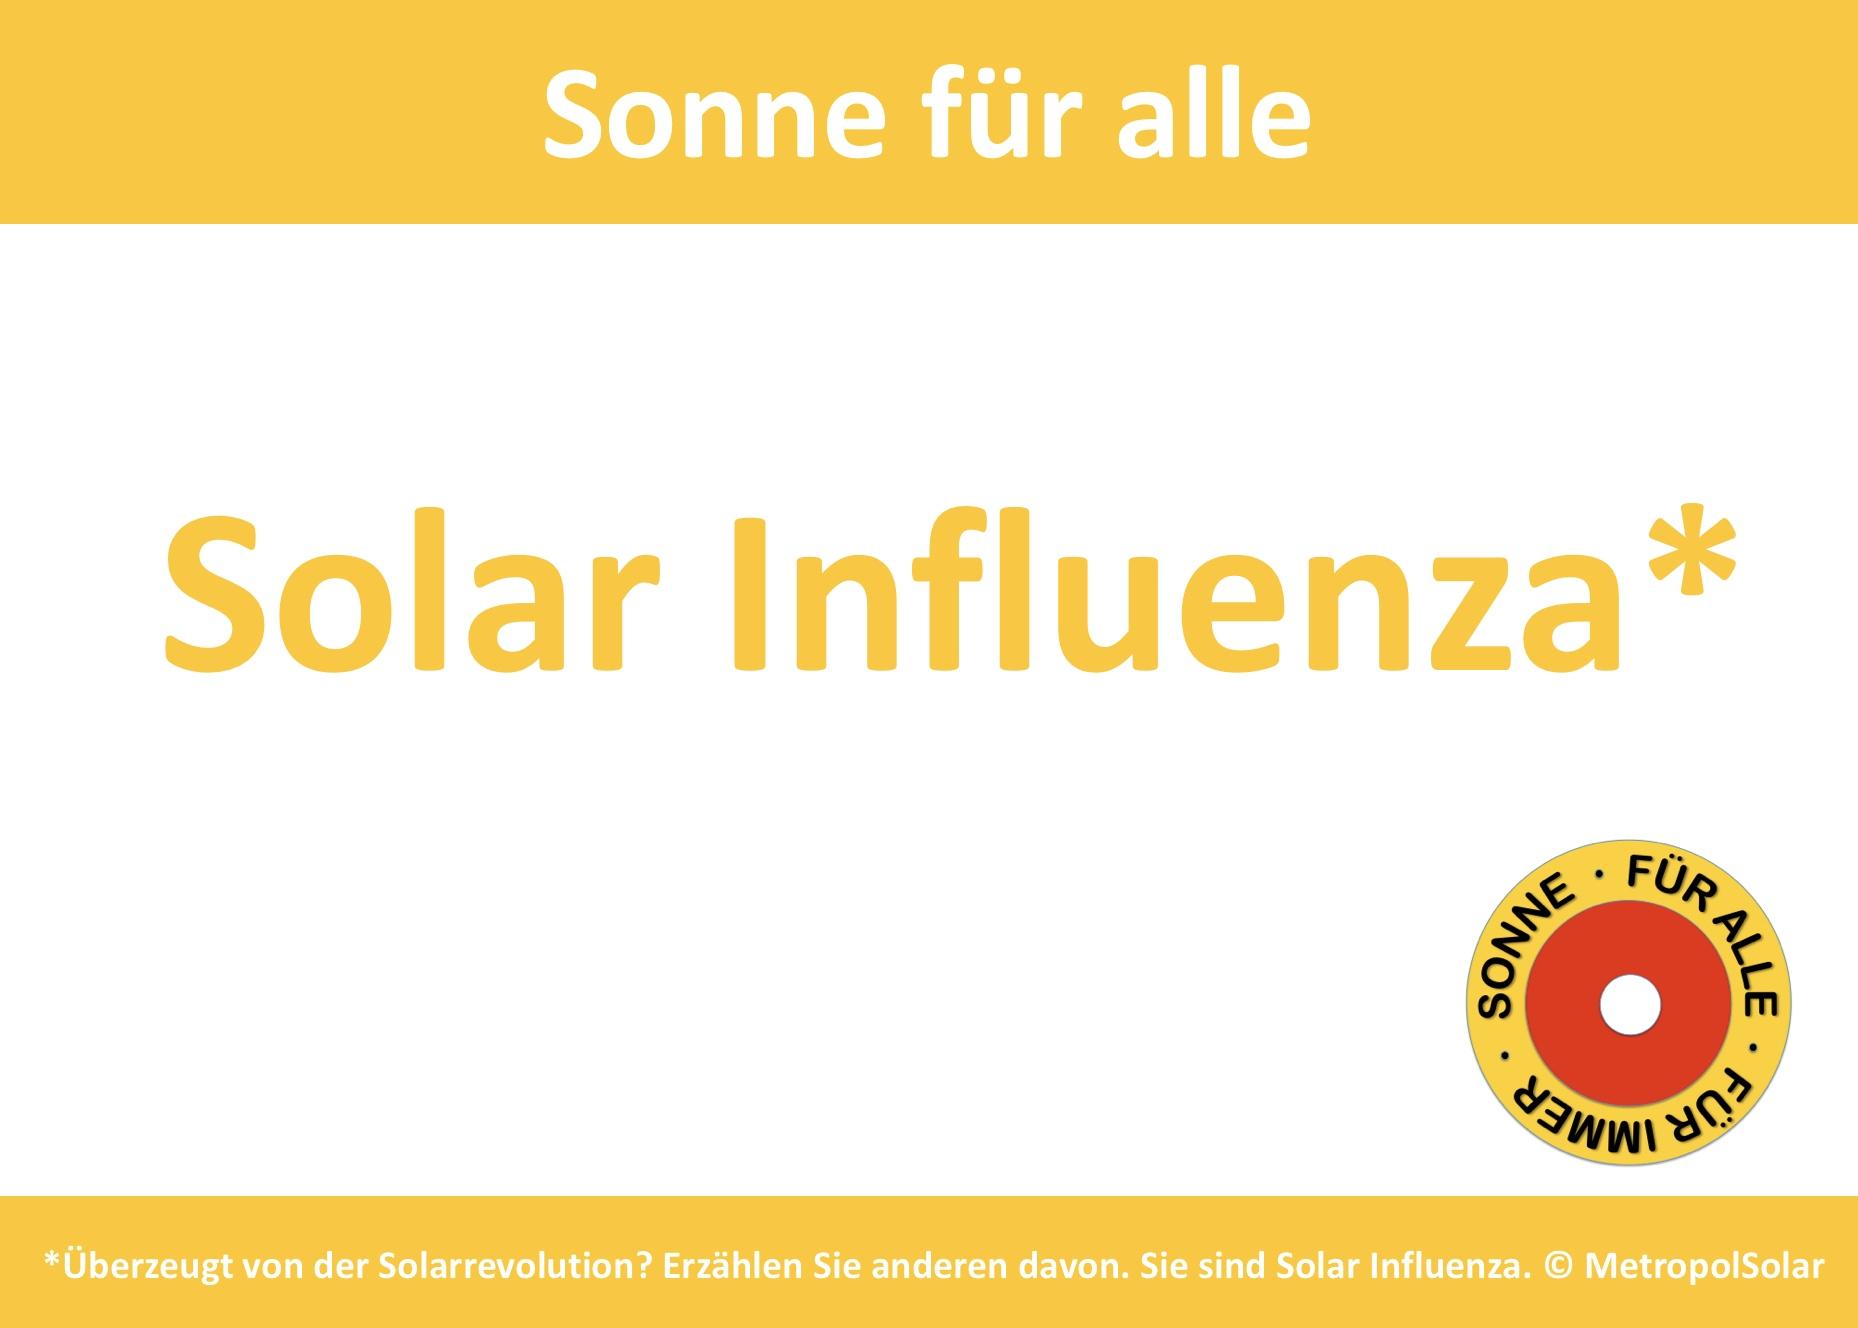 Solar-Influenza